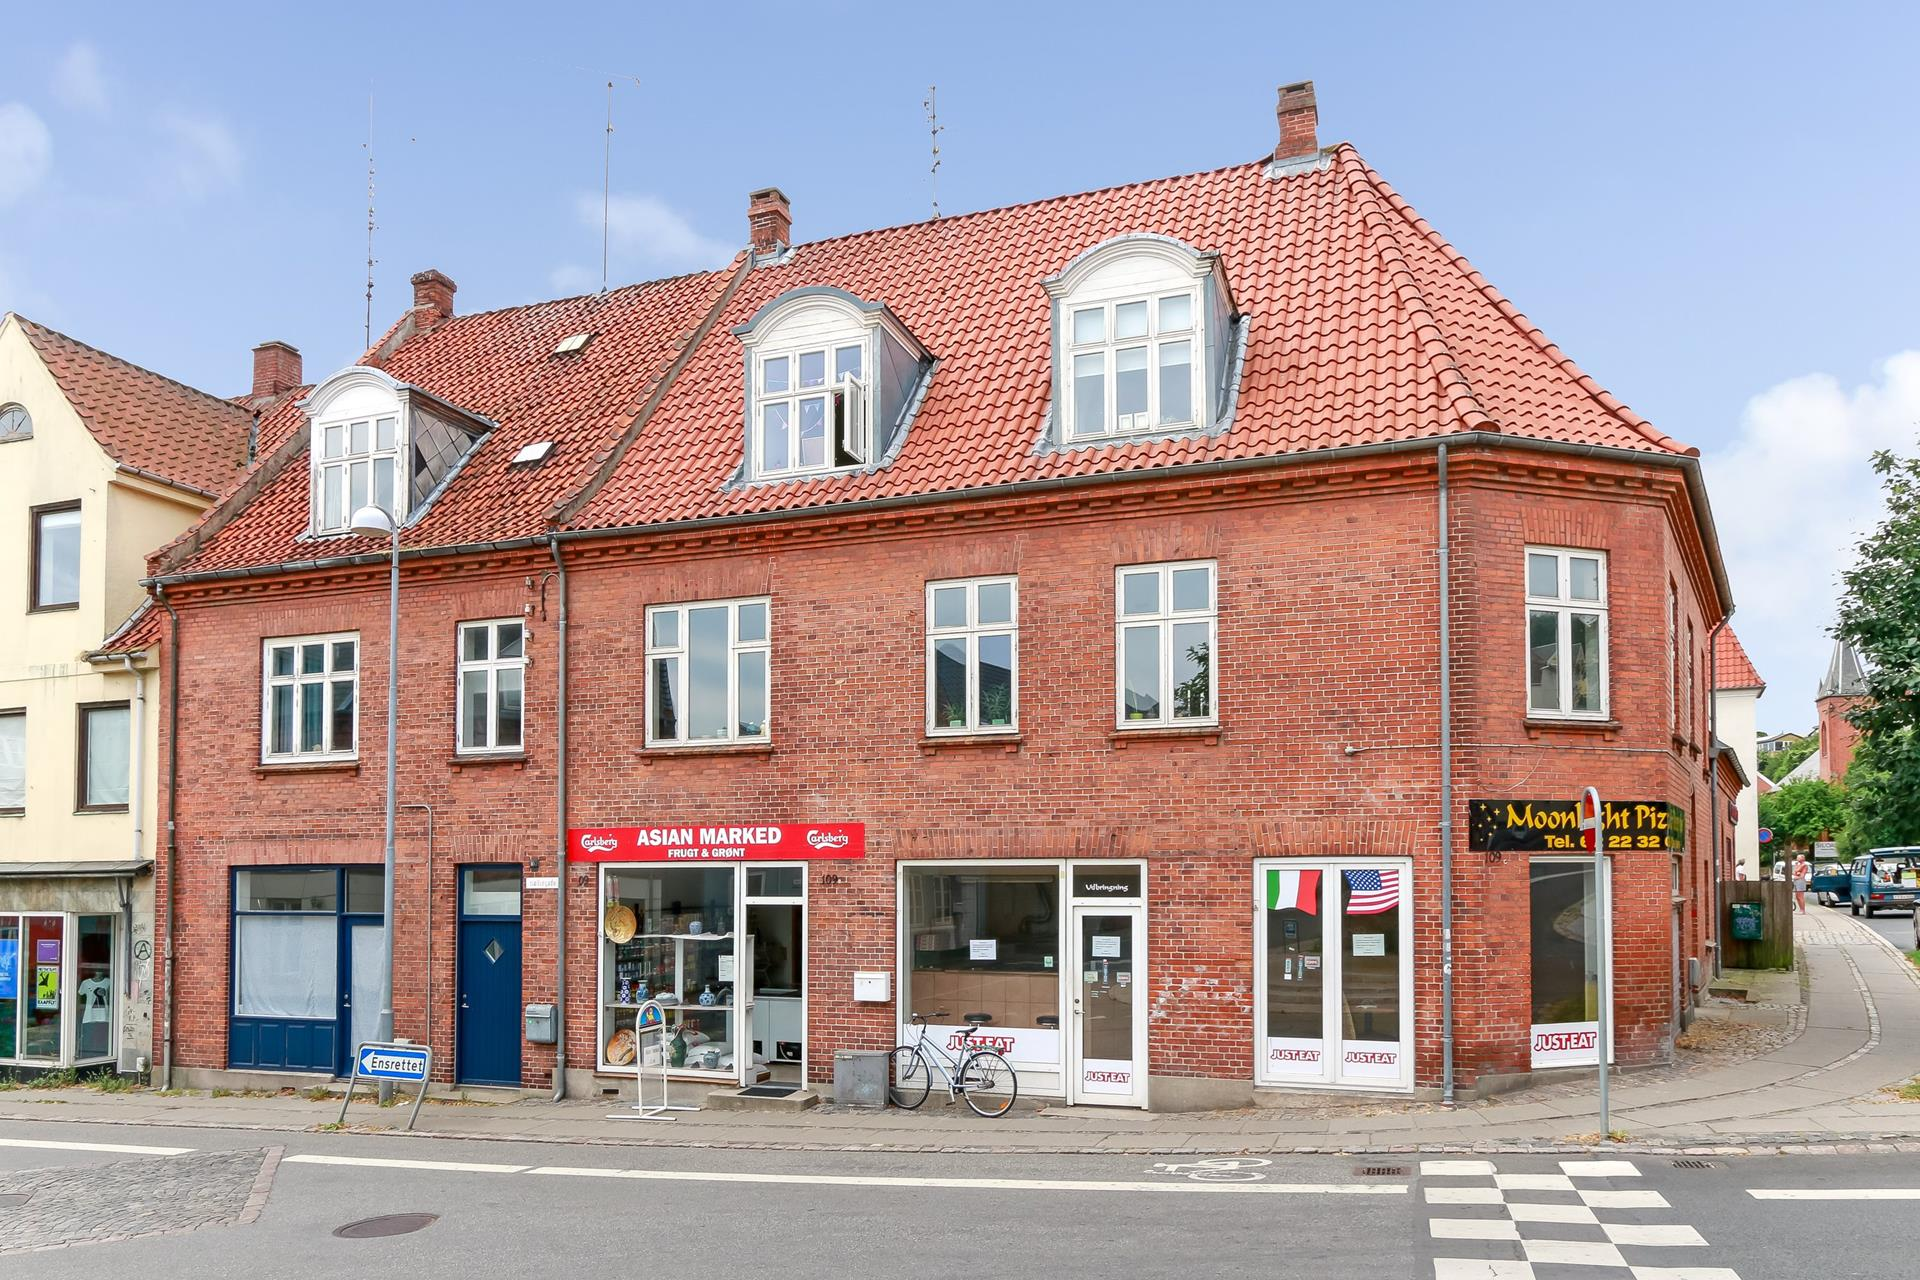 Bolig/erhverv på Møllergade i Svendborg - Ejendommen